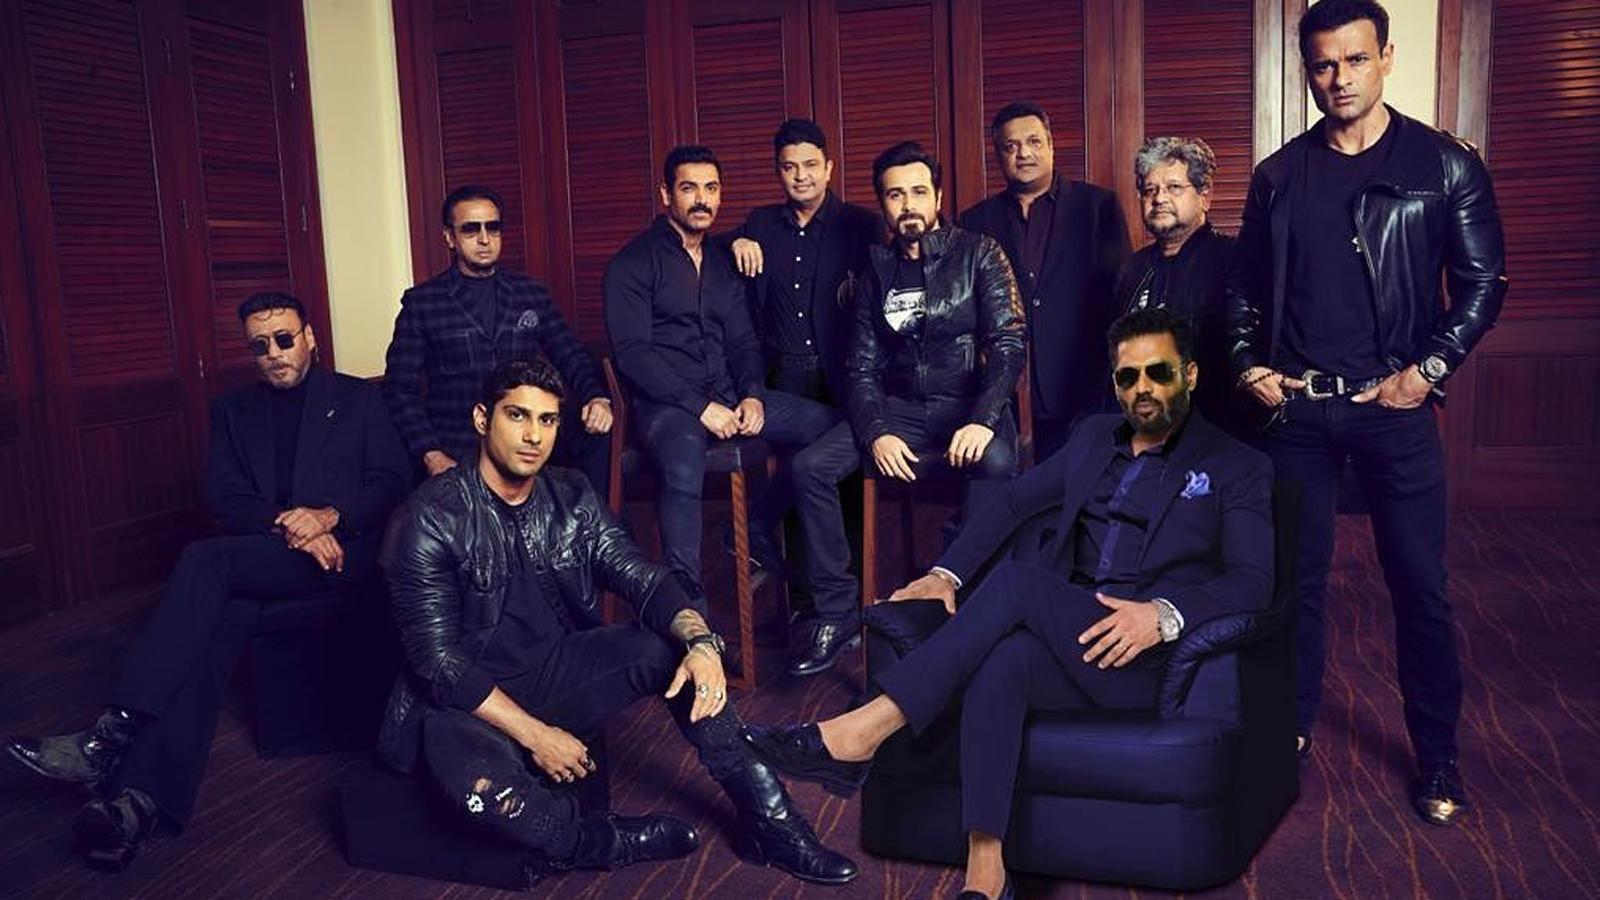 John Abraham, Jackie Shroff and Suniel Shetty starrer 'Mumbai Saga' to release in June 2020